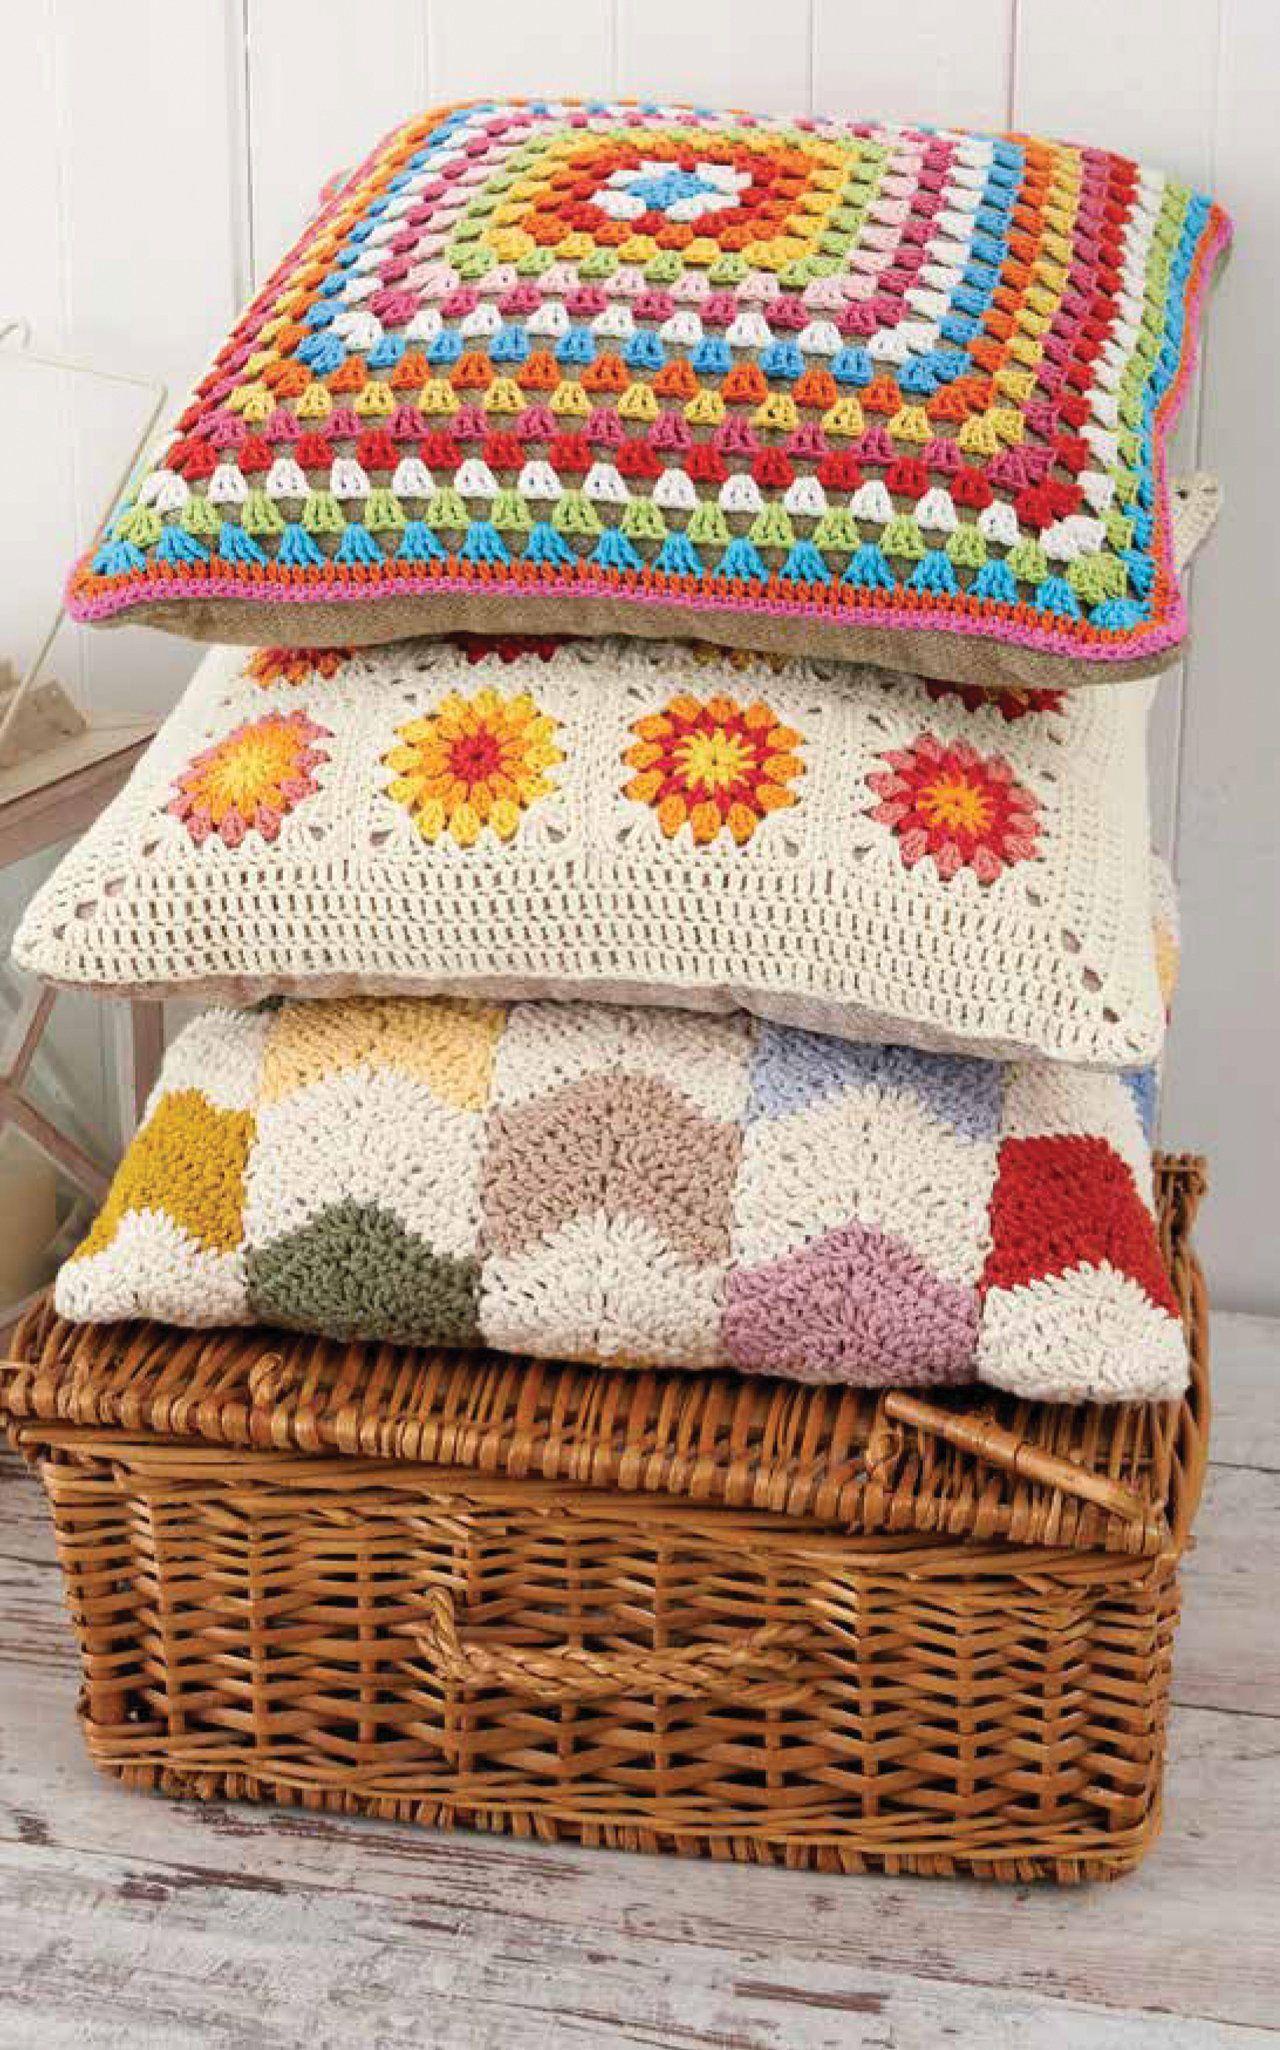 Boho Crochet 30 Hip And Happy Projects Amazoncouk Marinke Slump